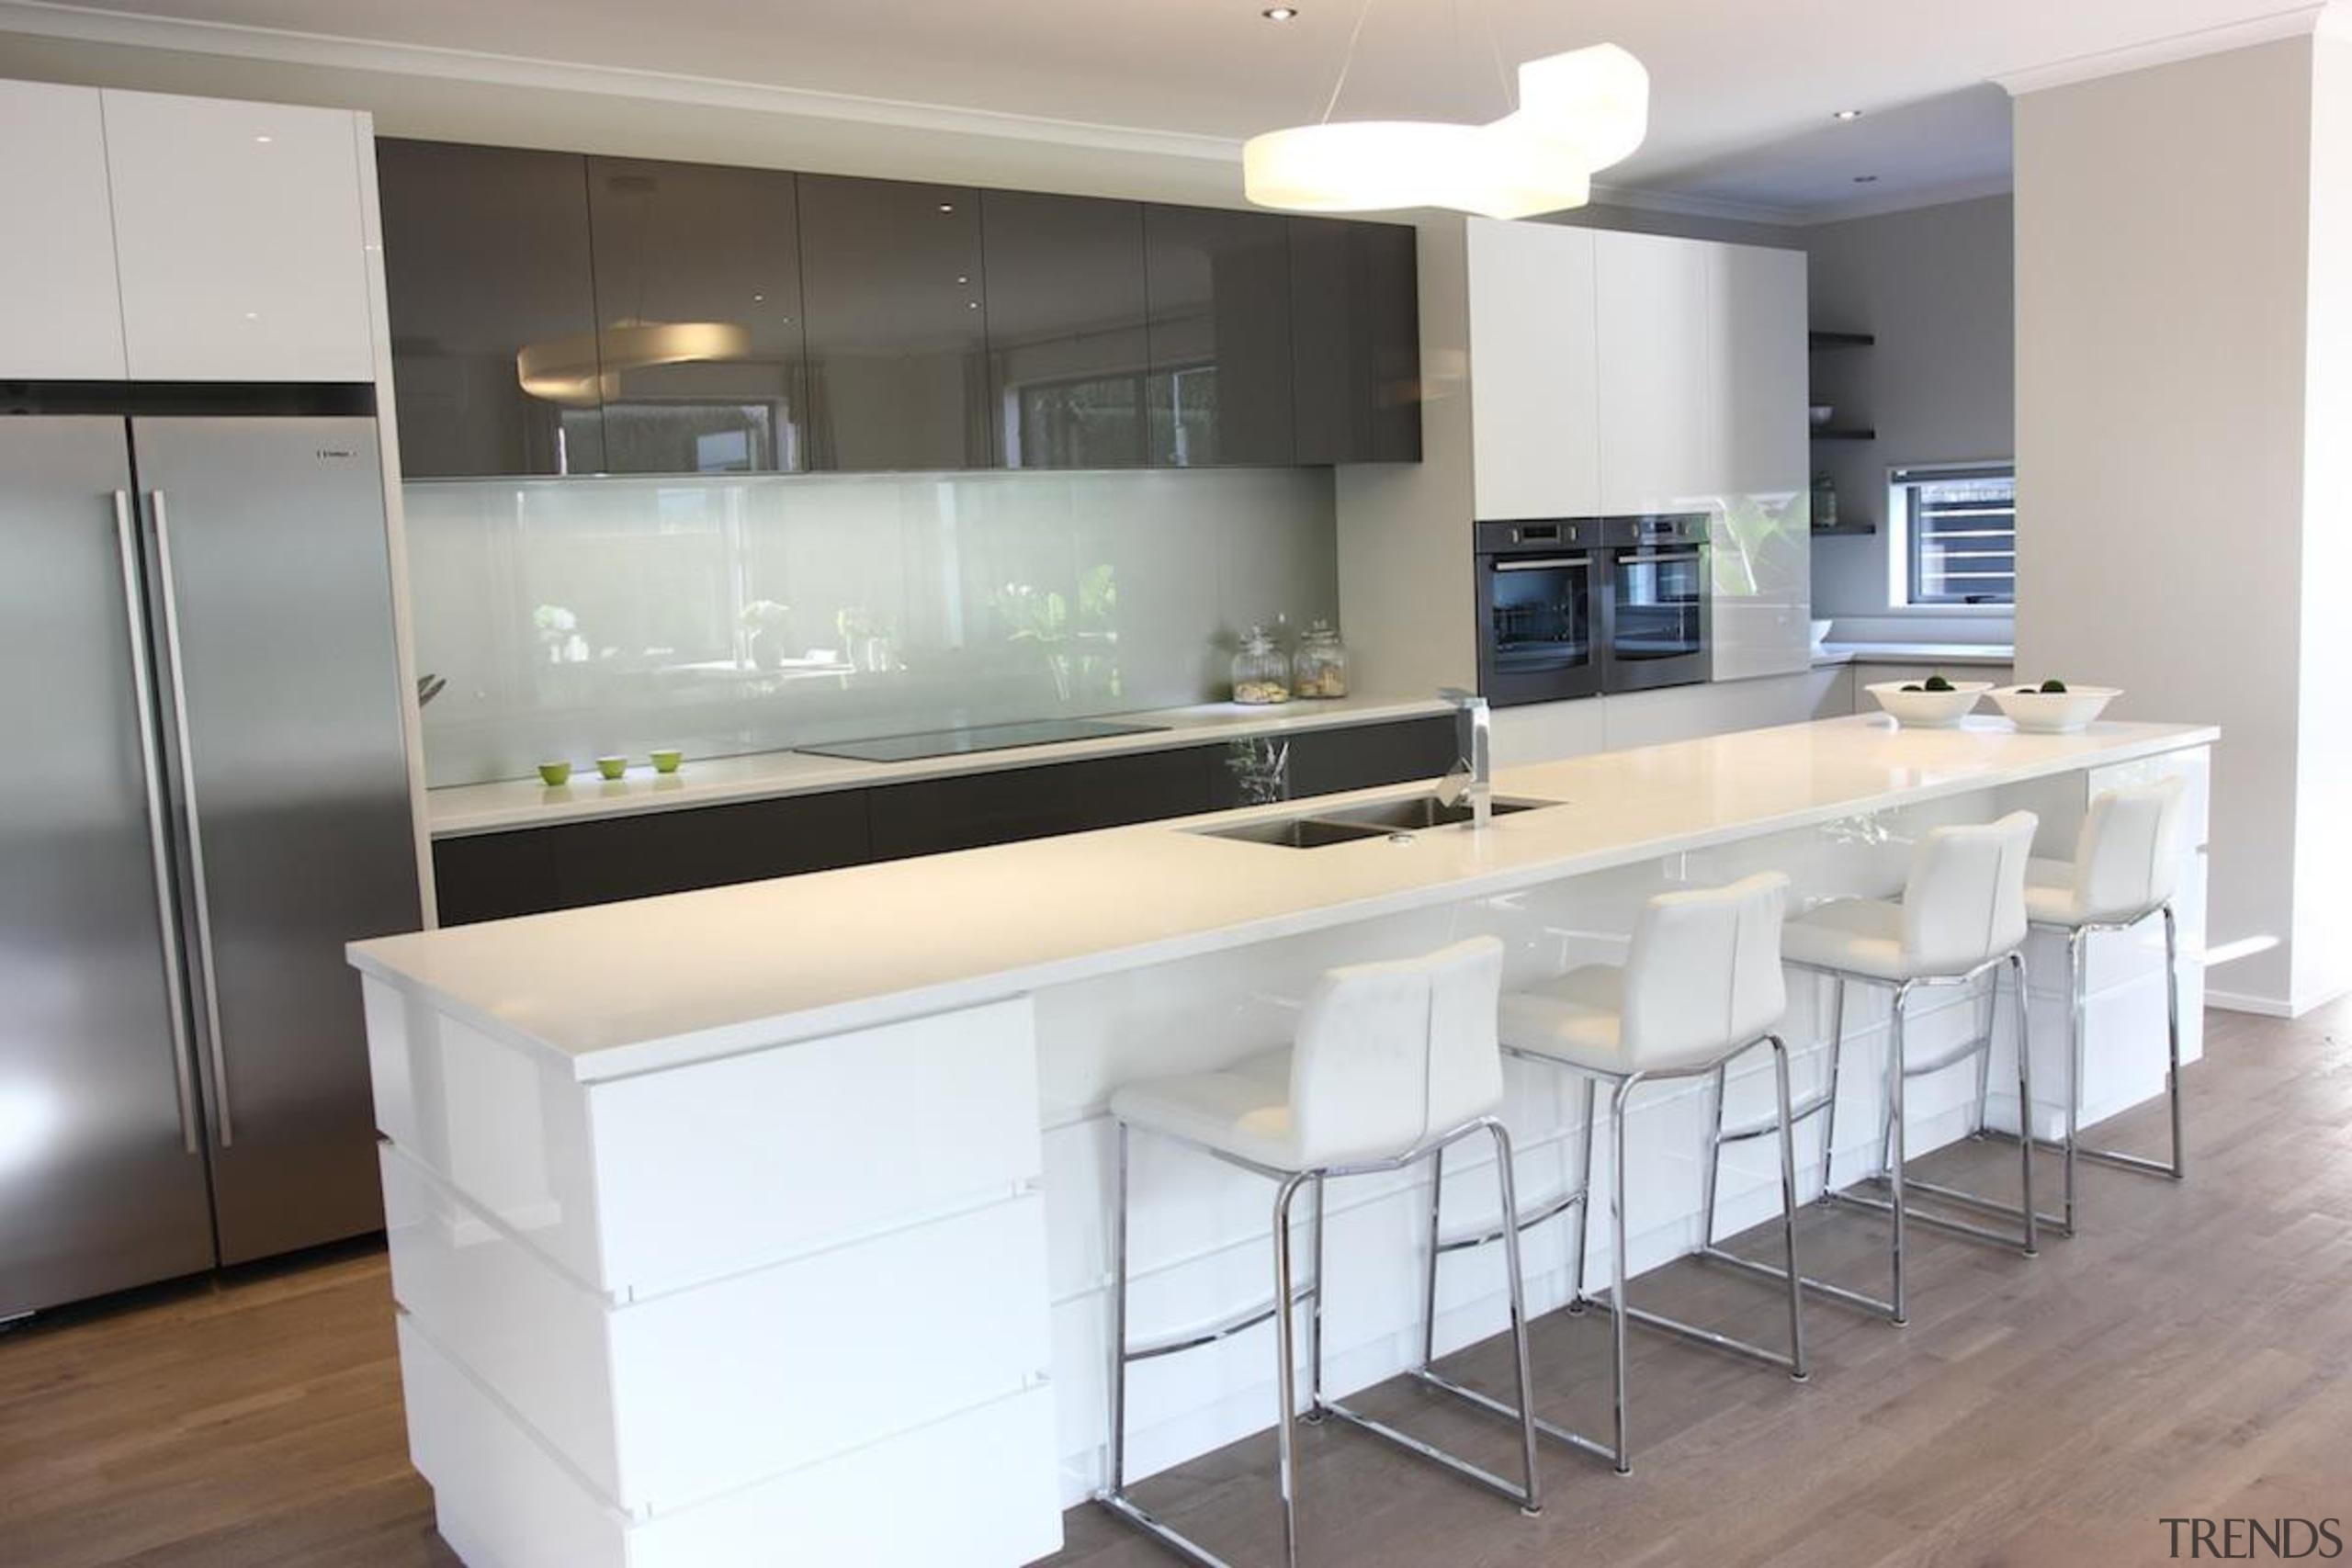 Sage Doors has been manufacturing quality roller doors cabinetry, countertop, cuisine classique, interior design, kitchen, real estate, gray